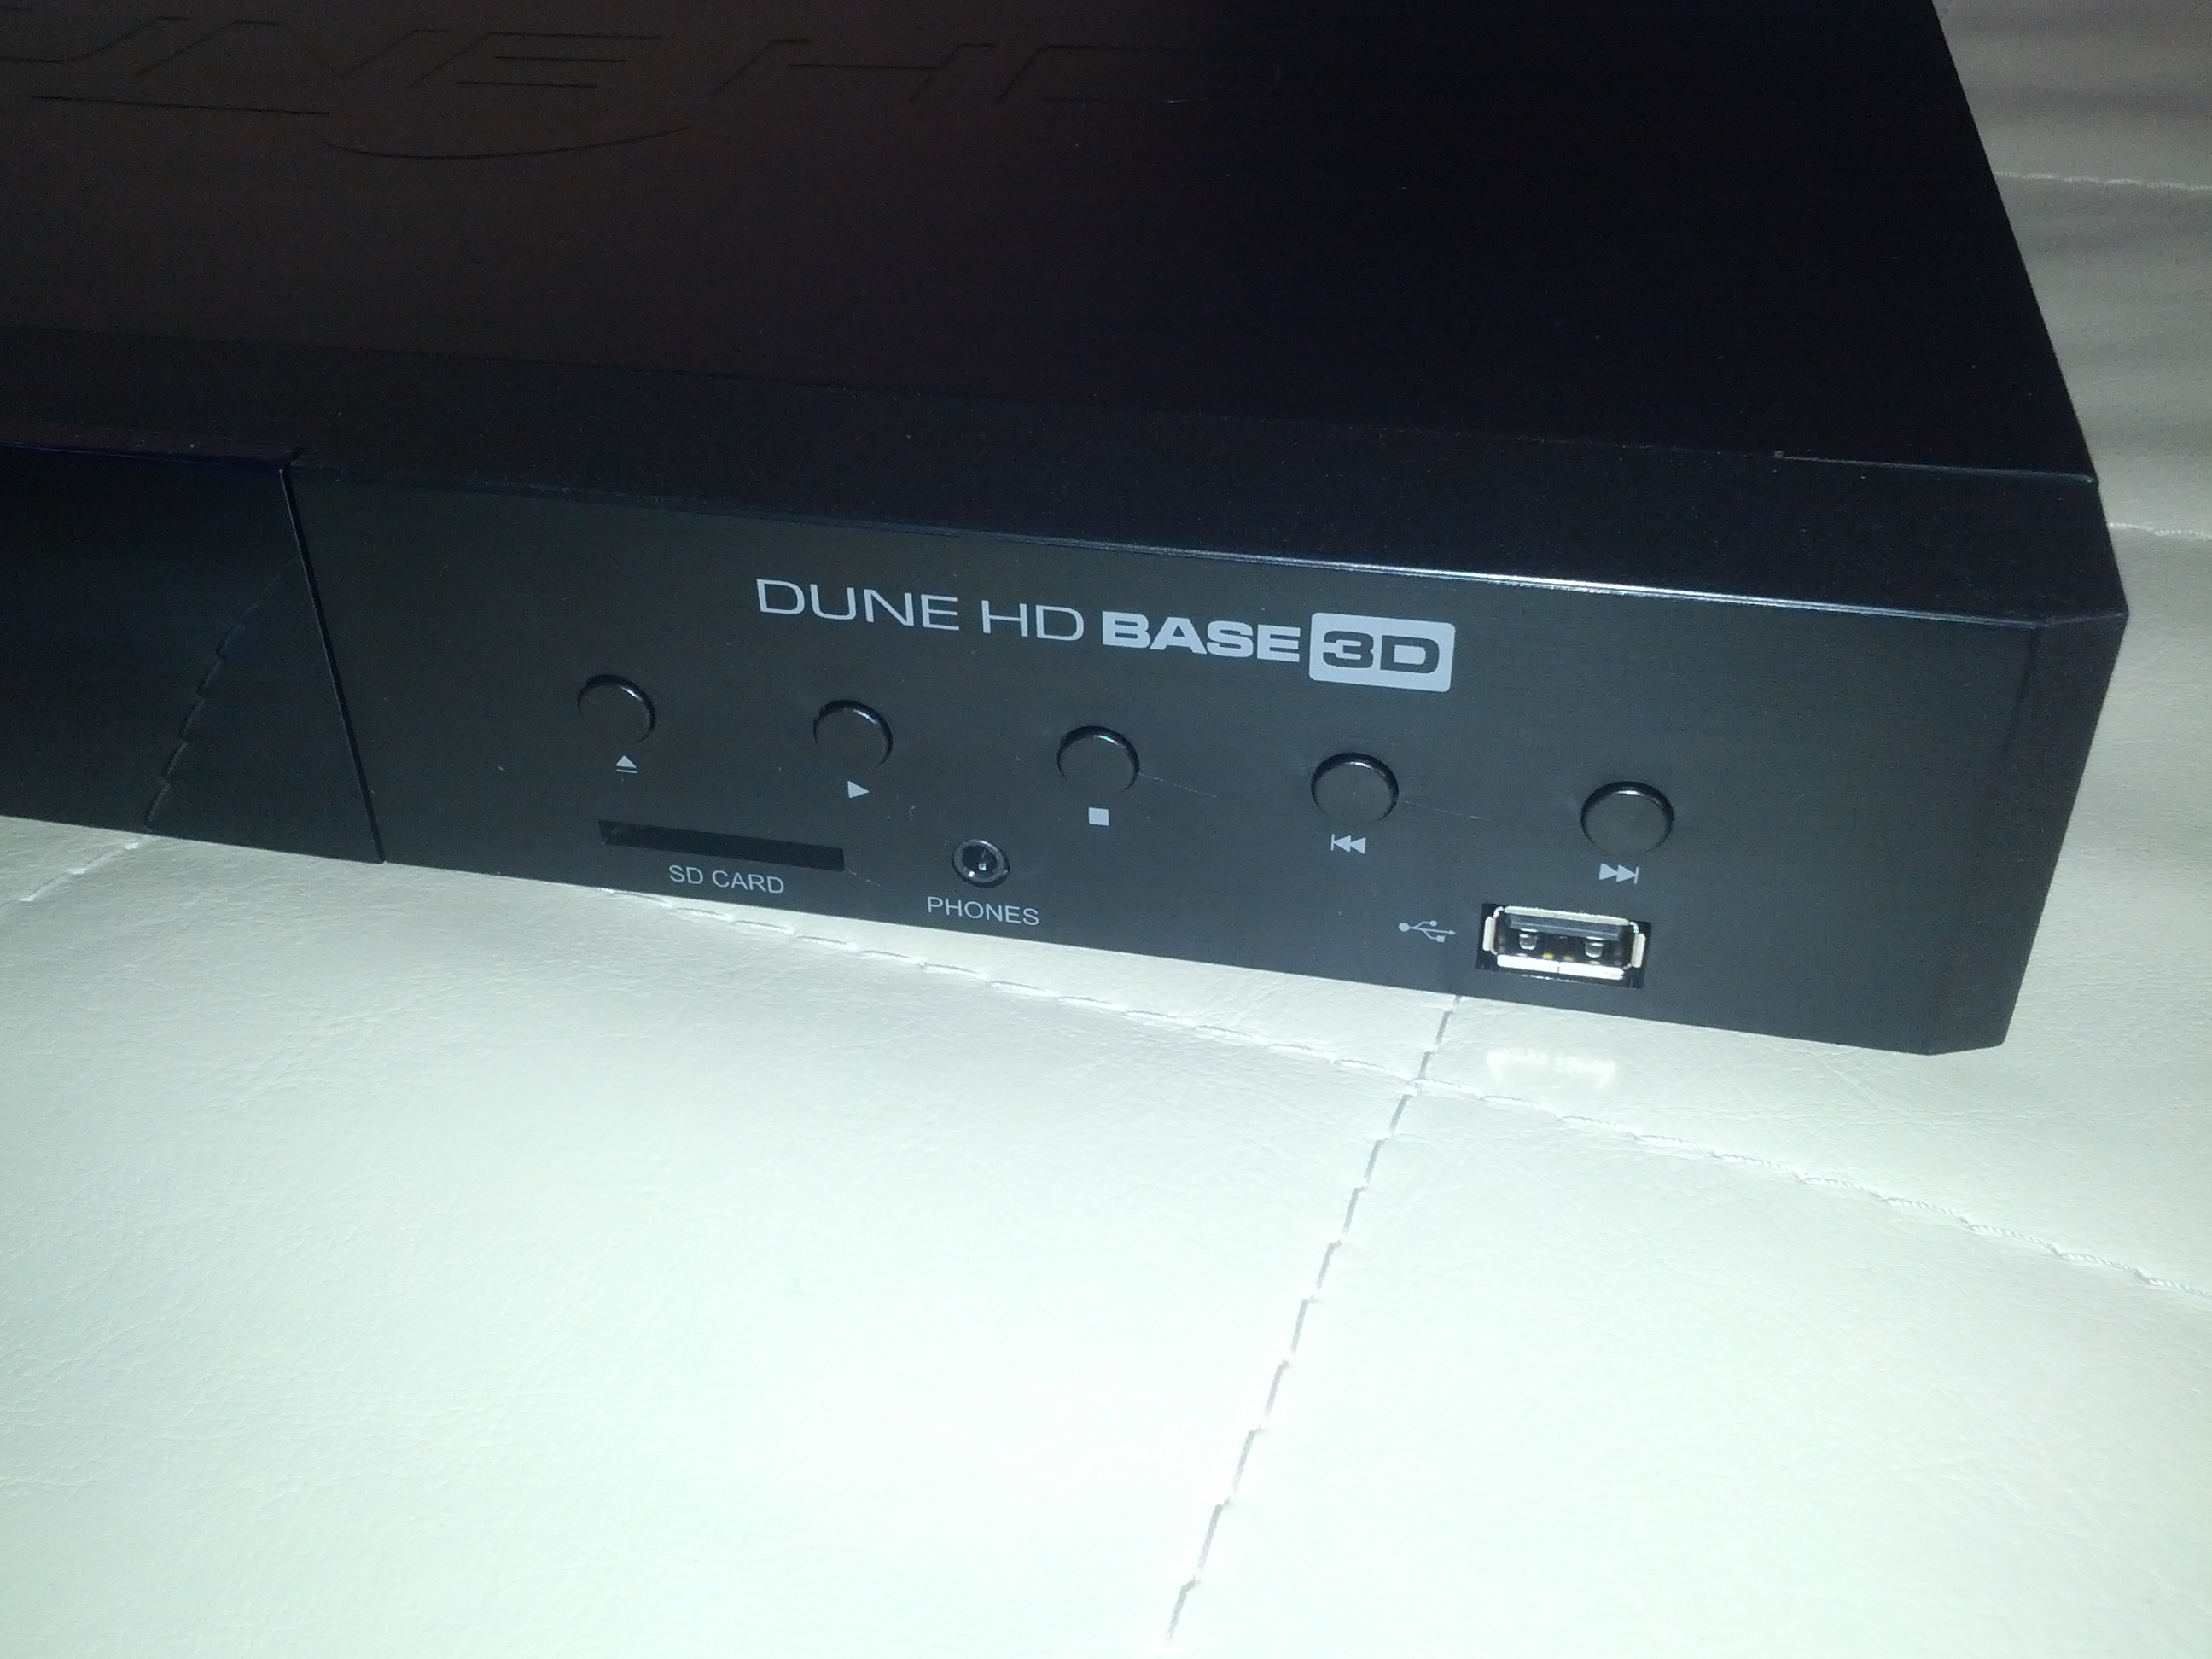 Dune HD Base 3D - механические кнопки